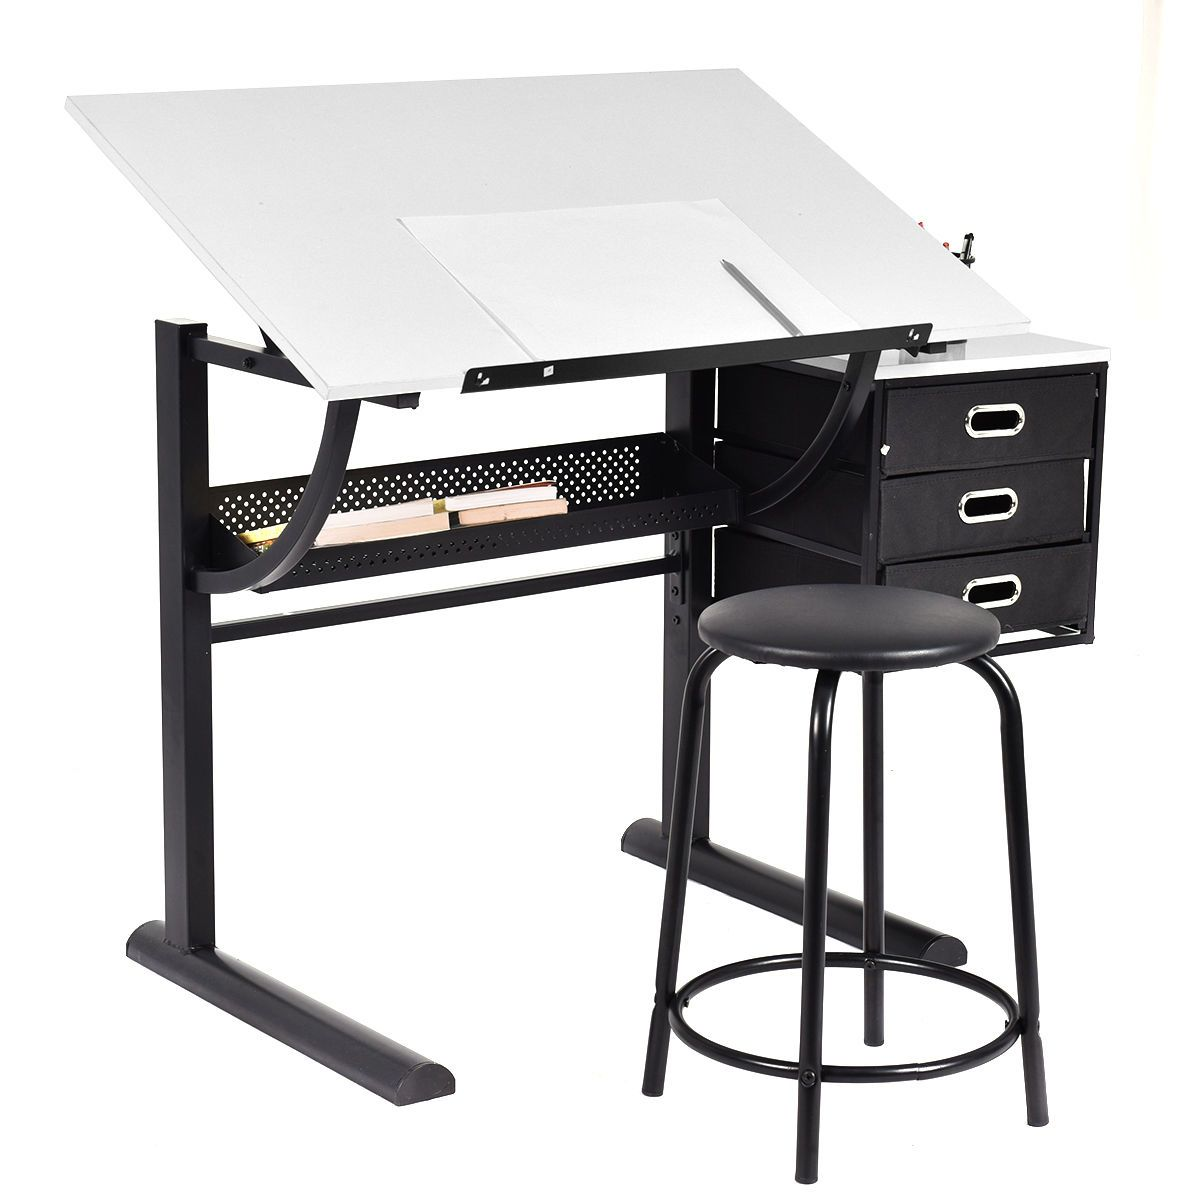 Strange Adjustable Drafting Table Art Craft Drawing Desk W Stool Creativecarmelina Interior Chair Design Creativecarmelinacom